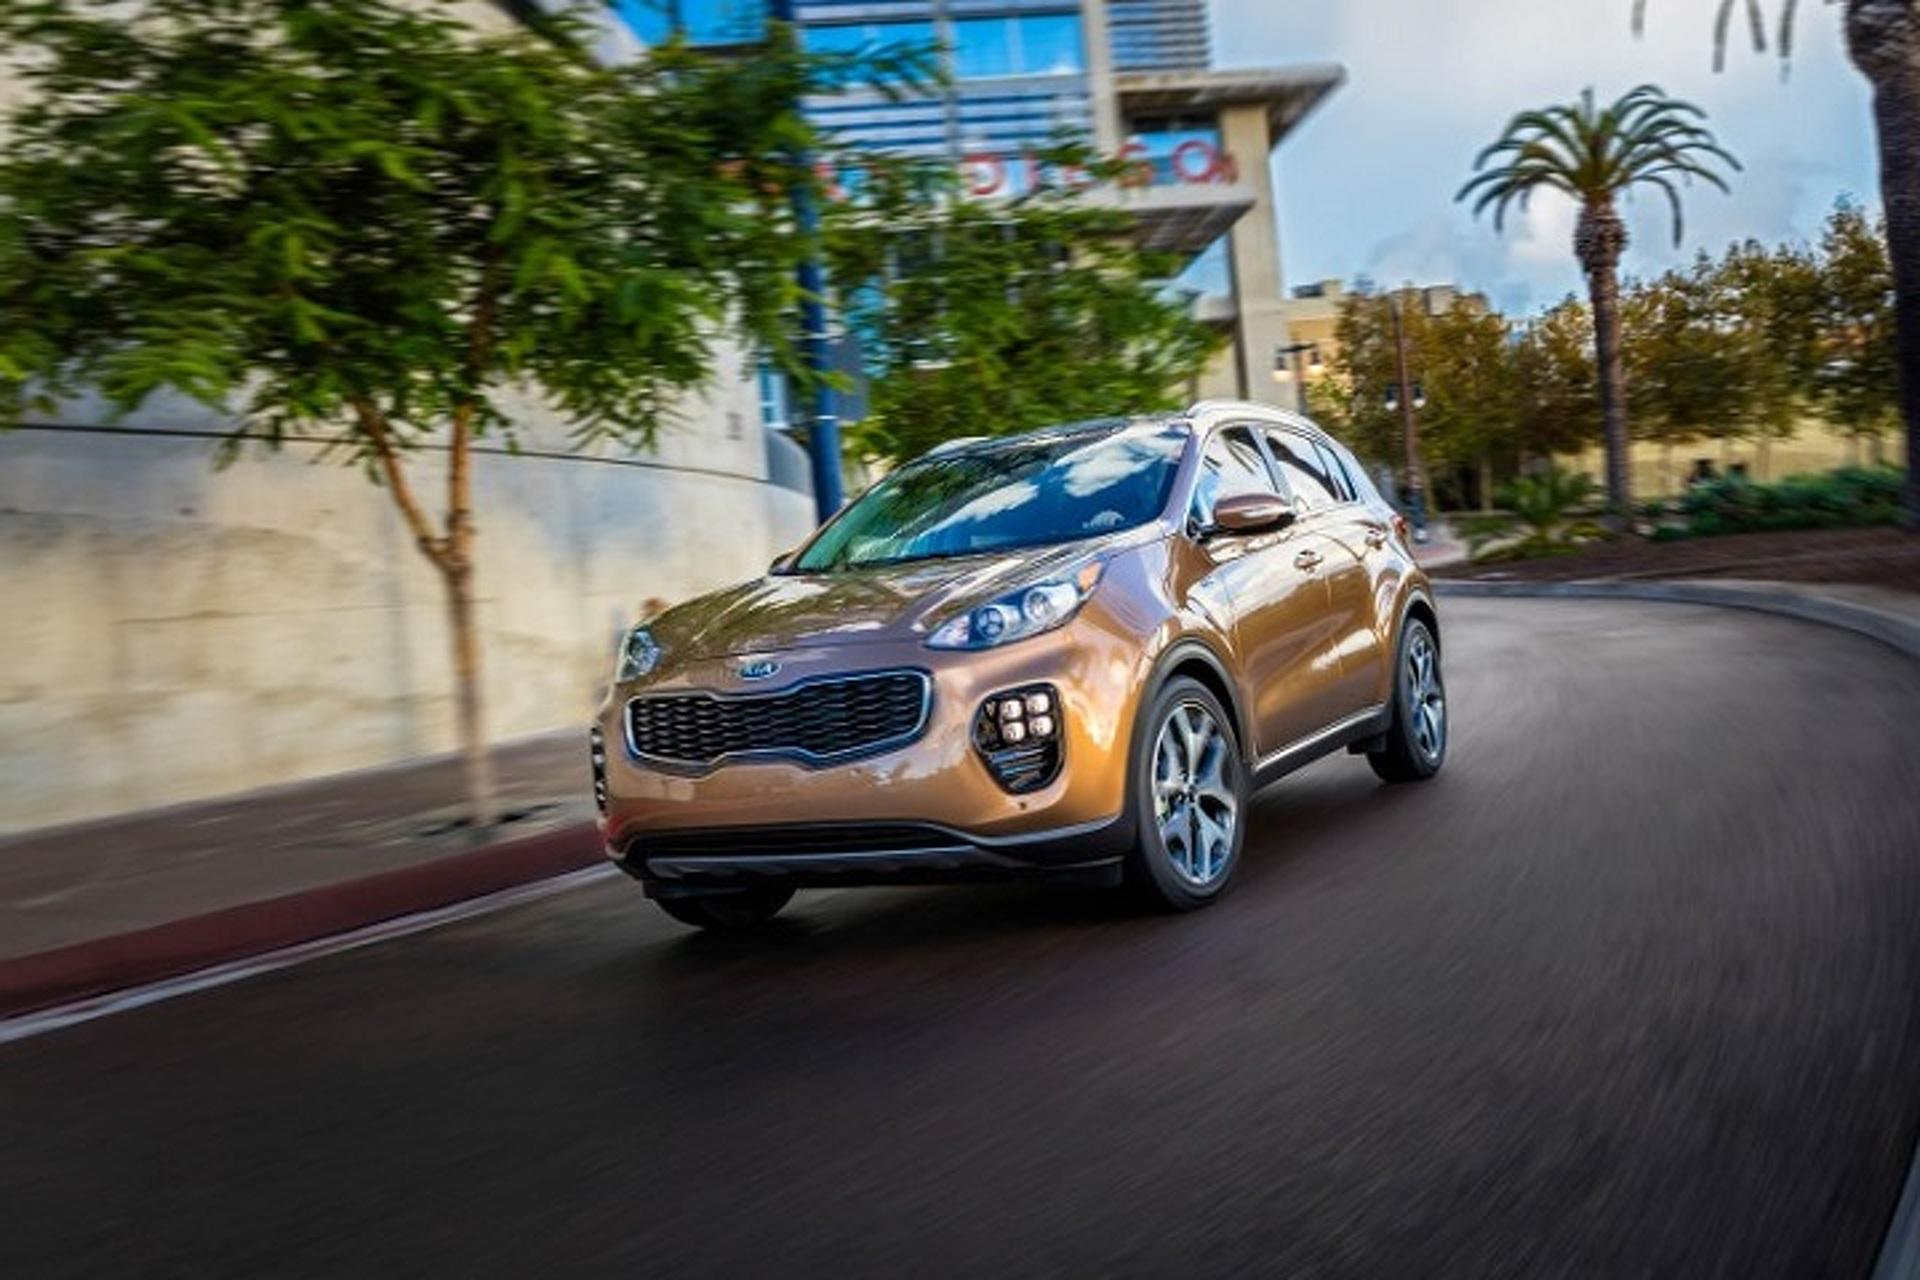 LA Auto Show: The 5 Best Consumer Vehicles